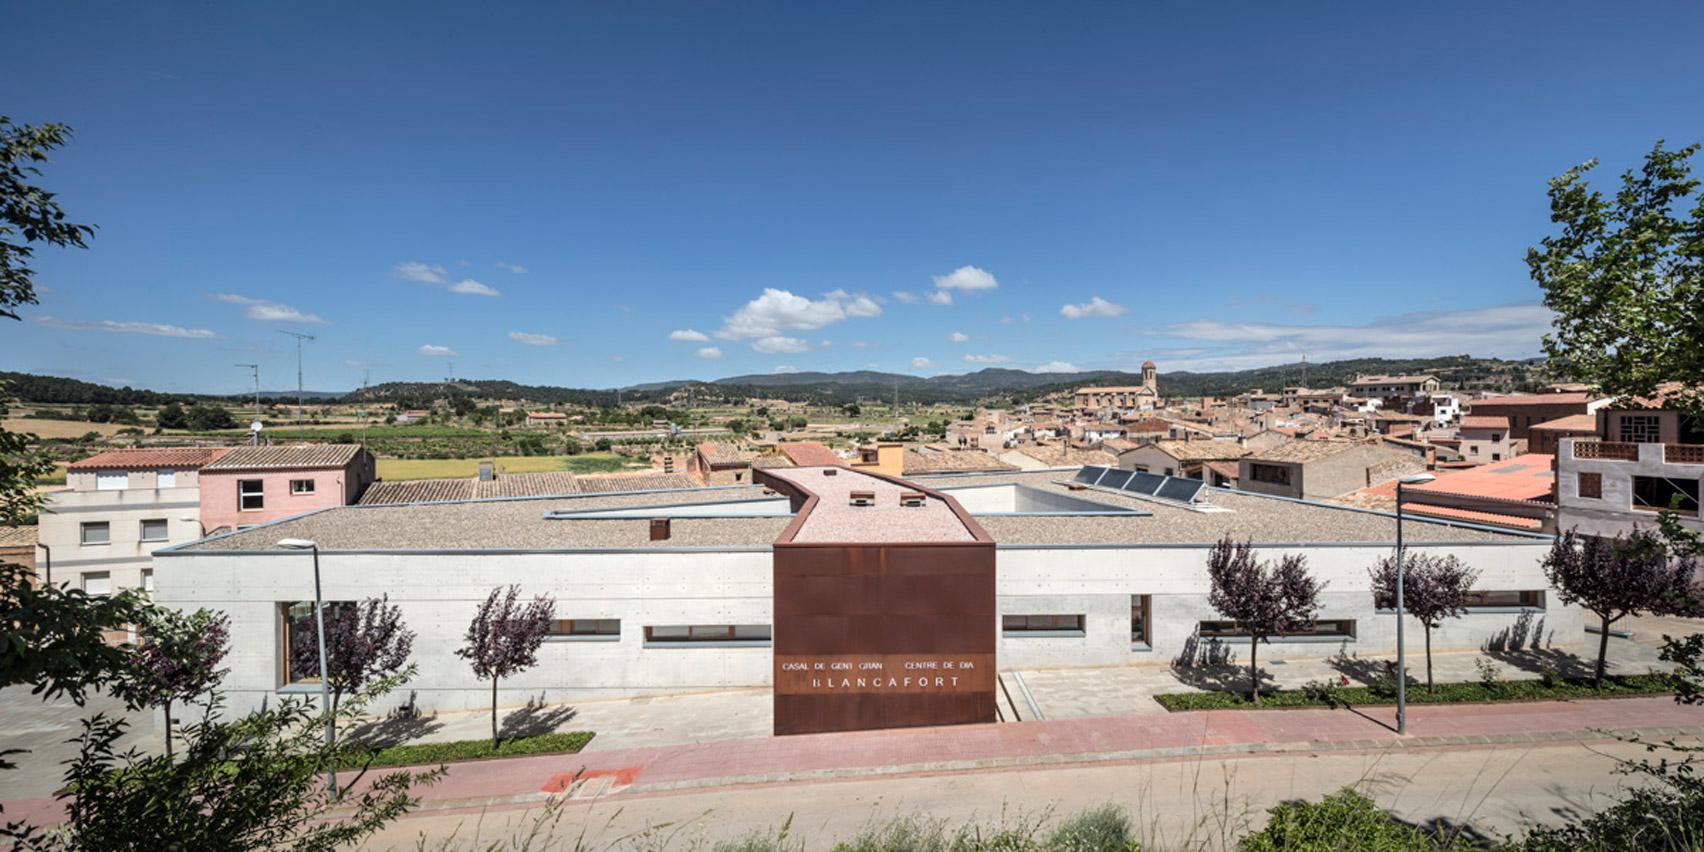 Blancafort care home by Guillem Carrera Arquitecte